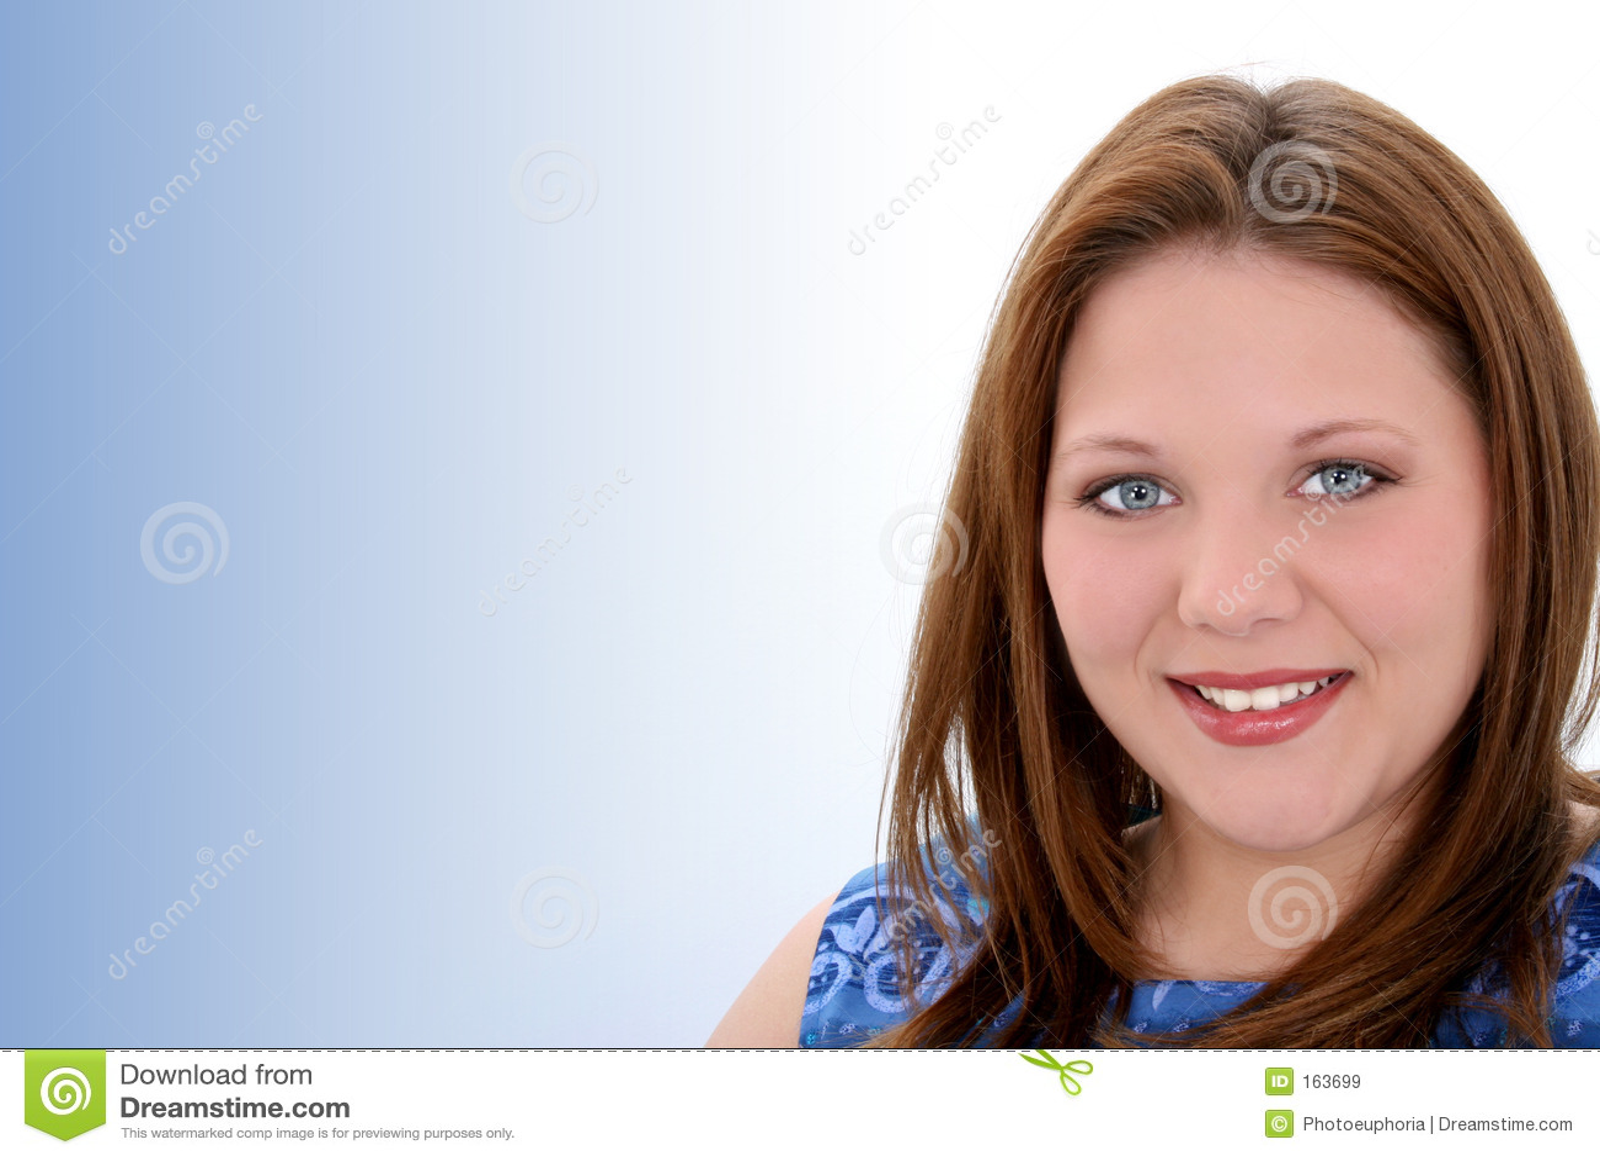 Beautiful Twenty Year Old Young Woman